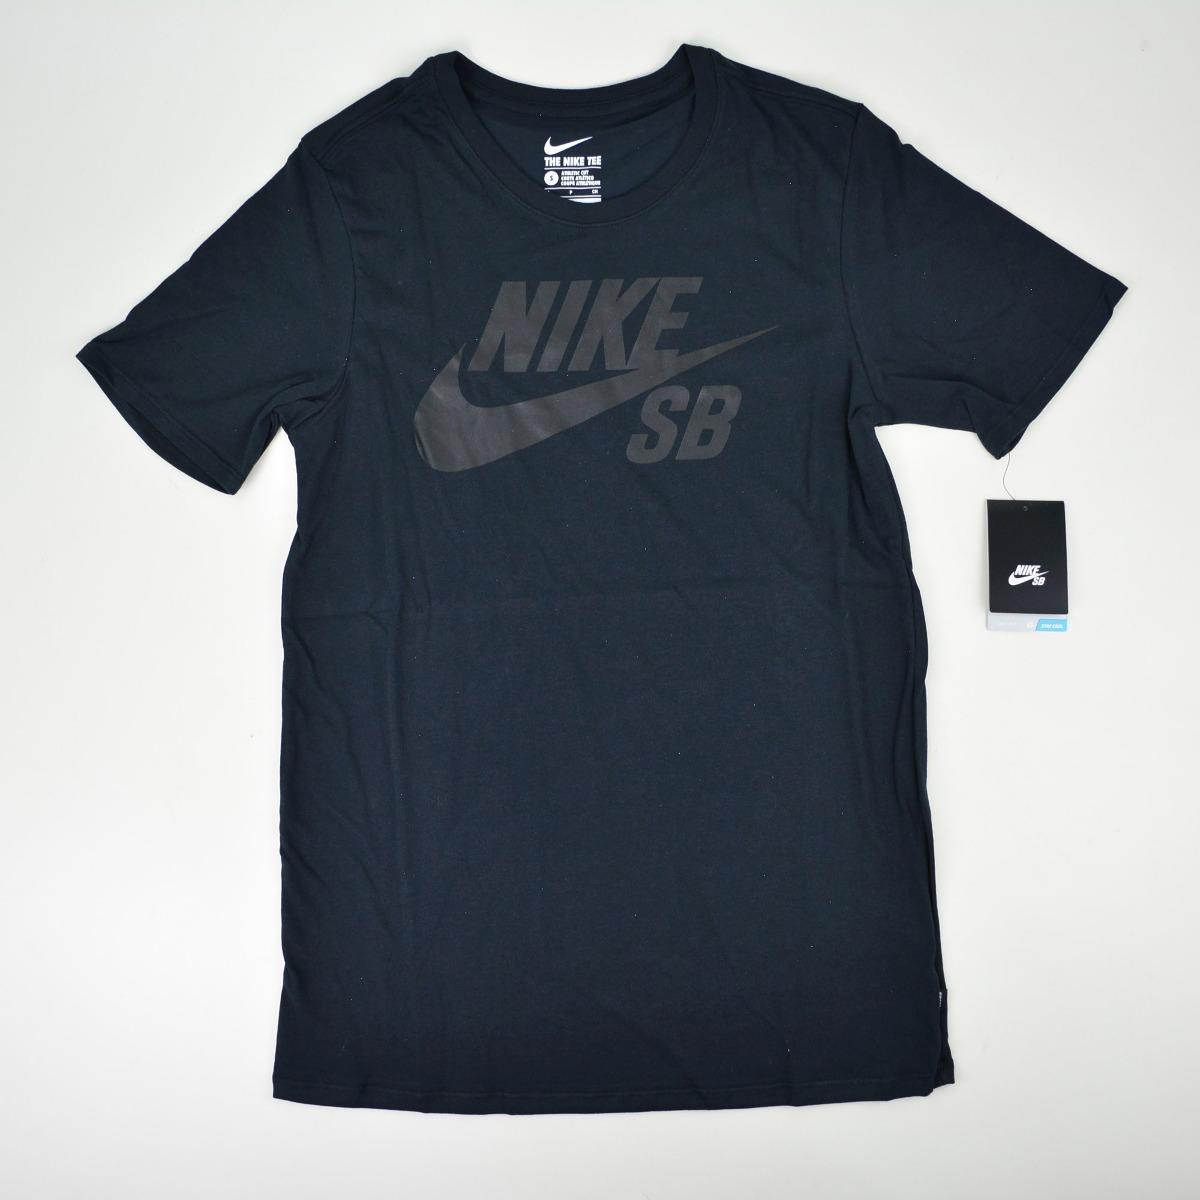 707a4c3908 camiseta nike sb logo preto. Carregando zoom.